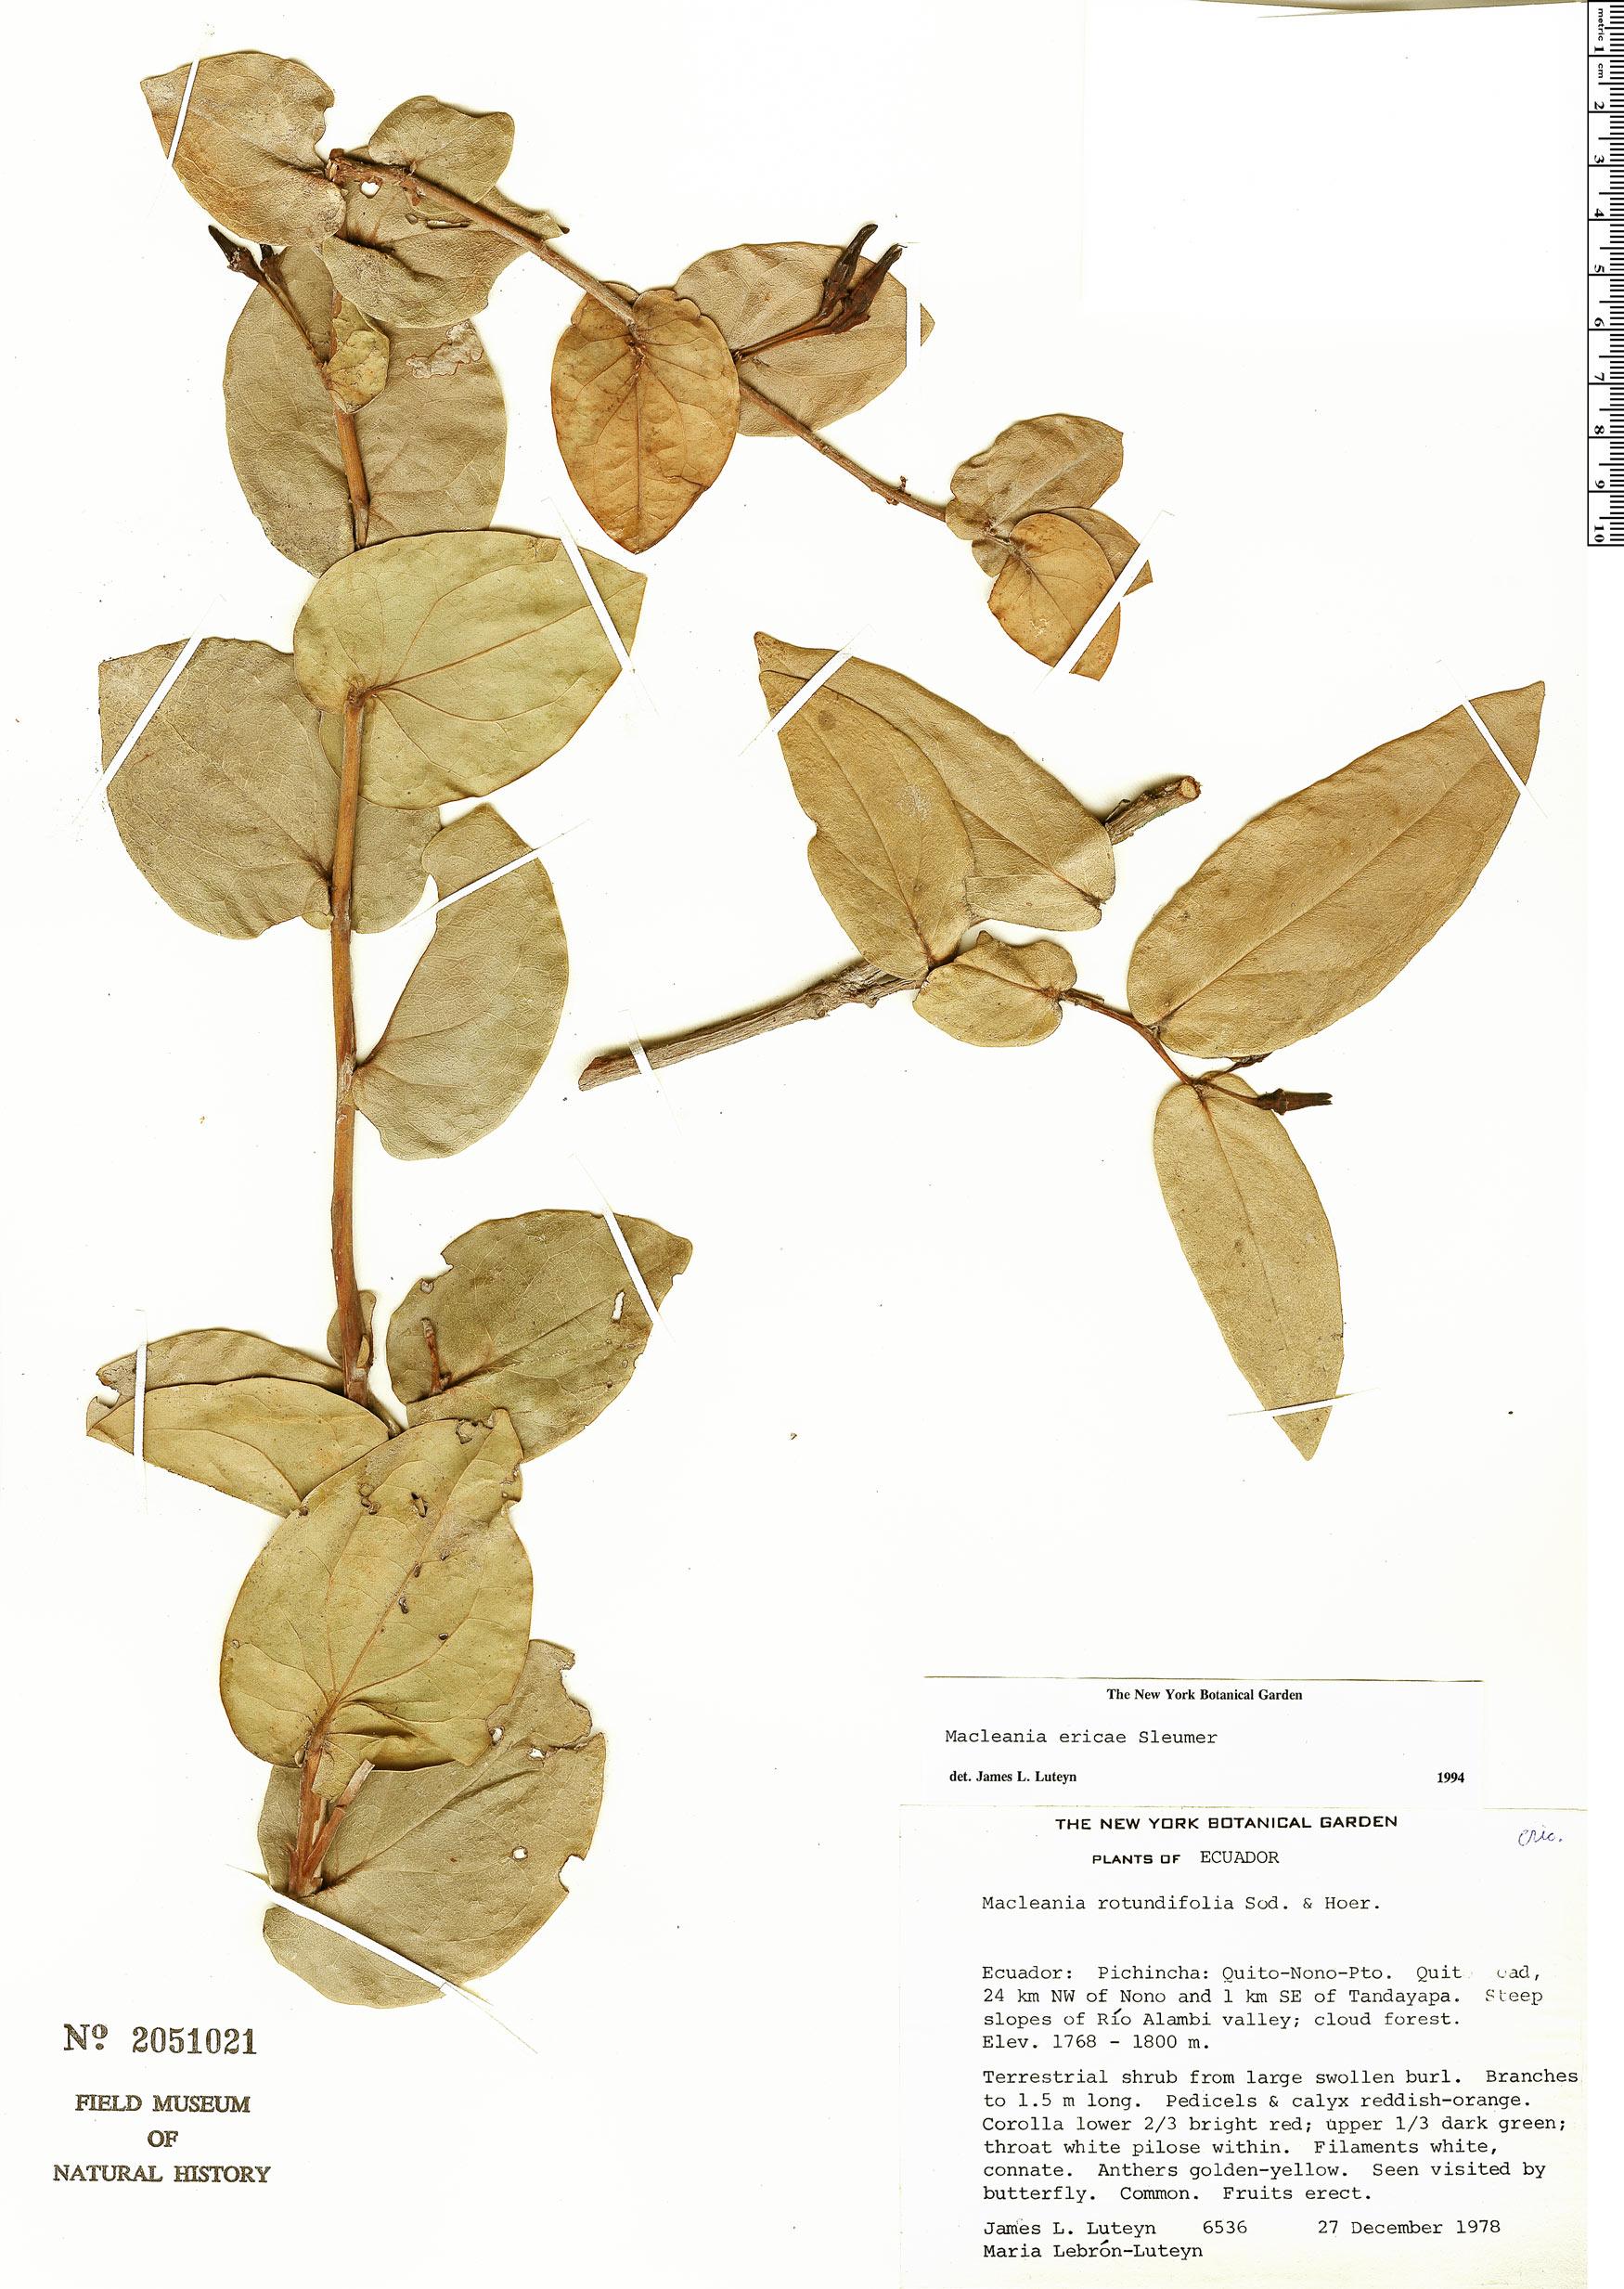 Espécimen: Macleania ericae